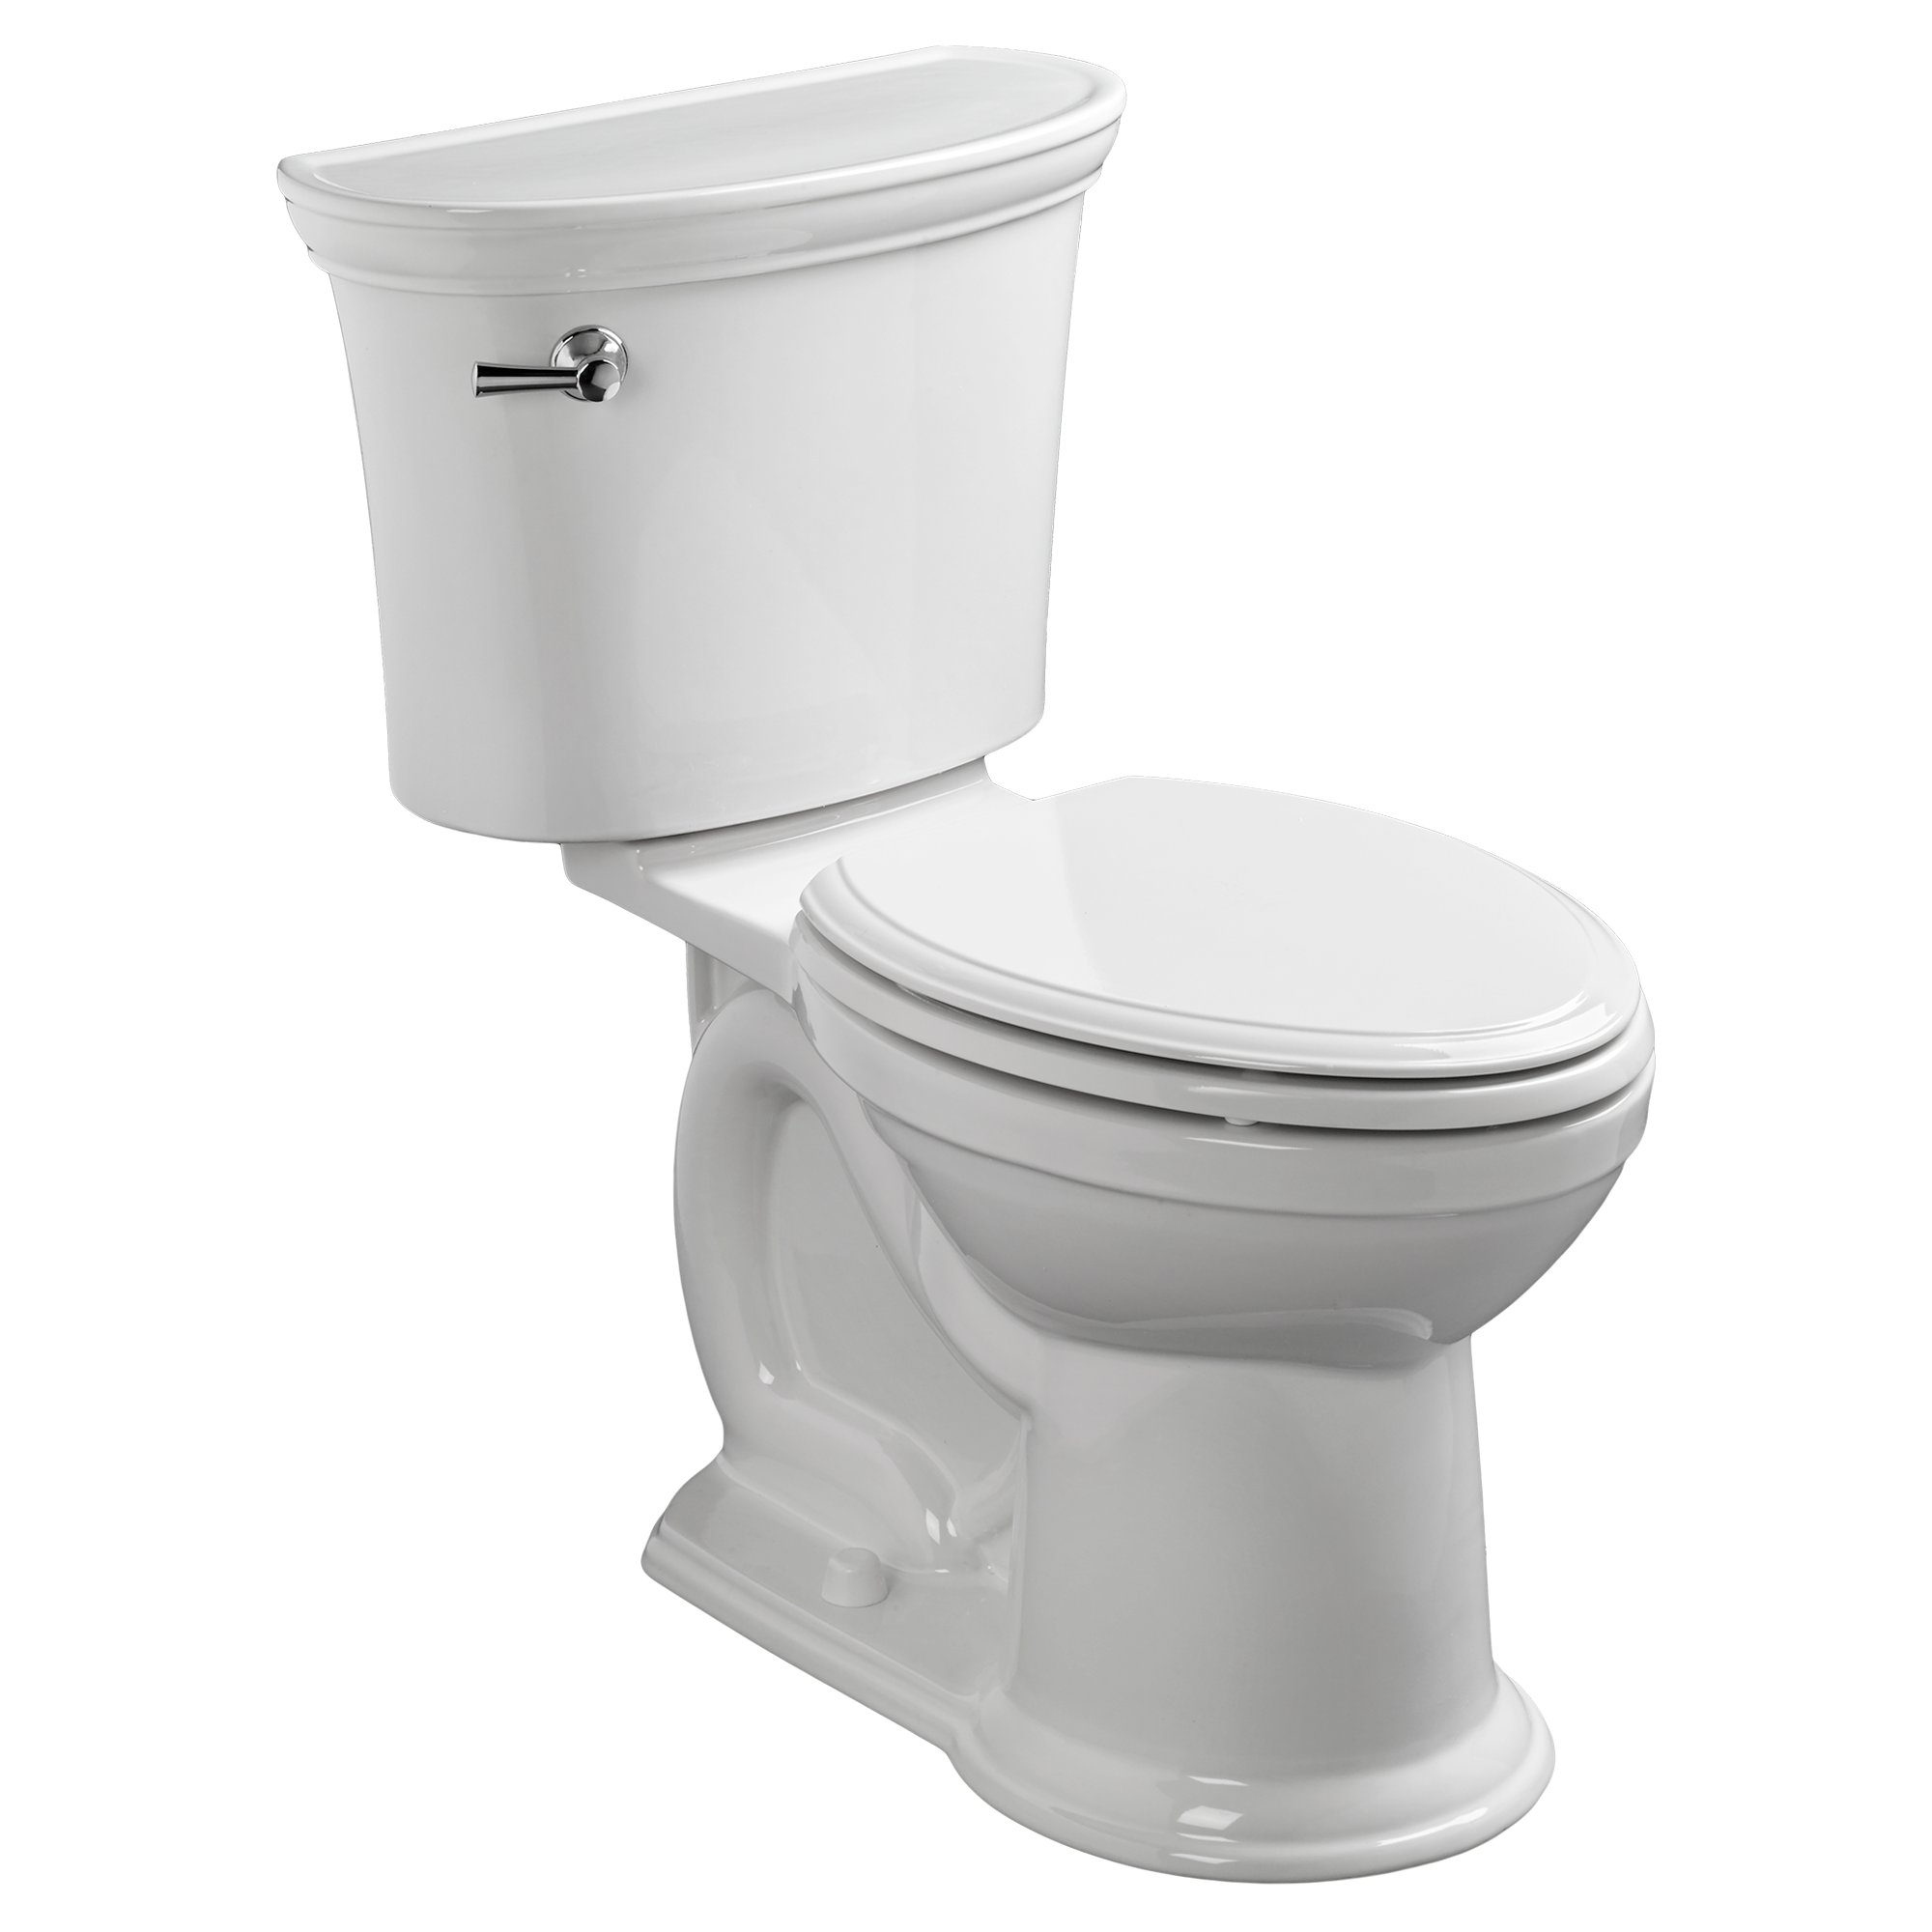 clip art royalty free Toilet HD PNG Transparent Toilet HD